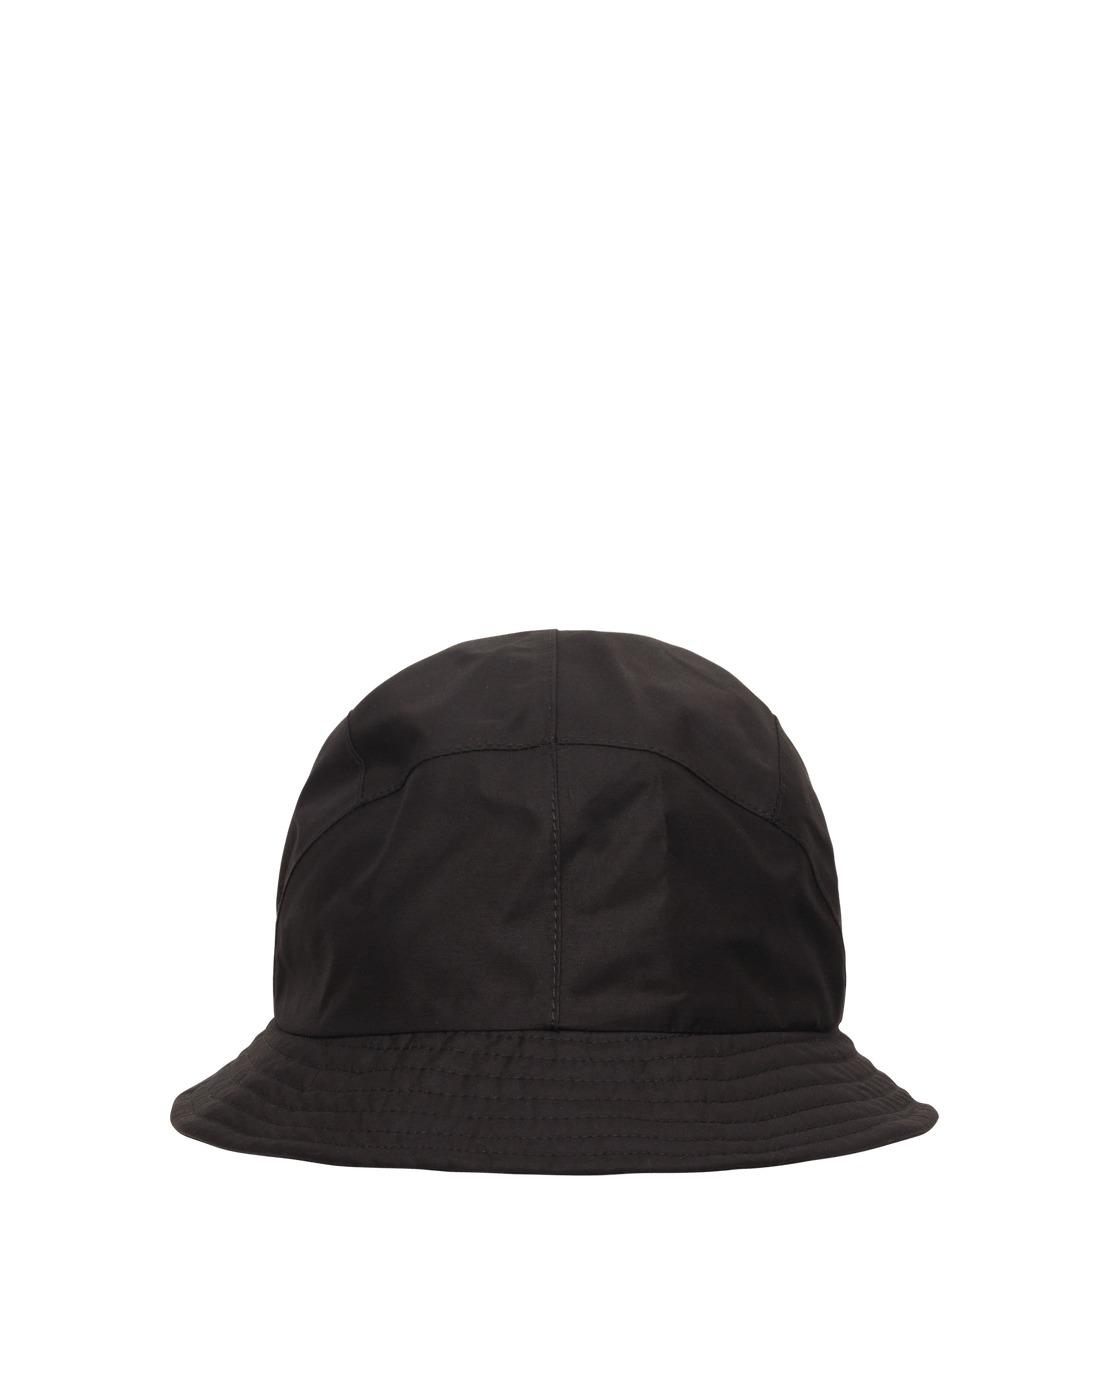 Stone Island Marina Bucket Hat Black